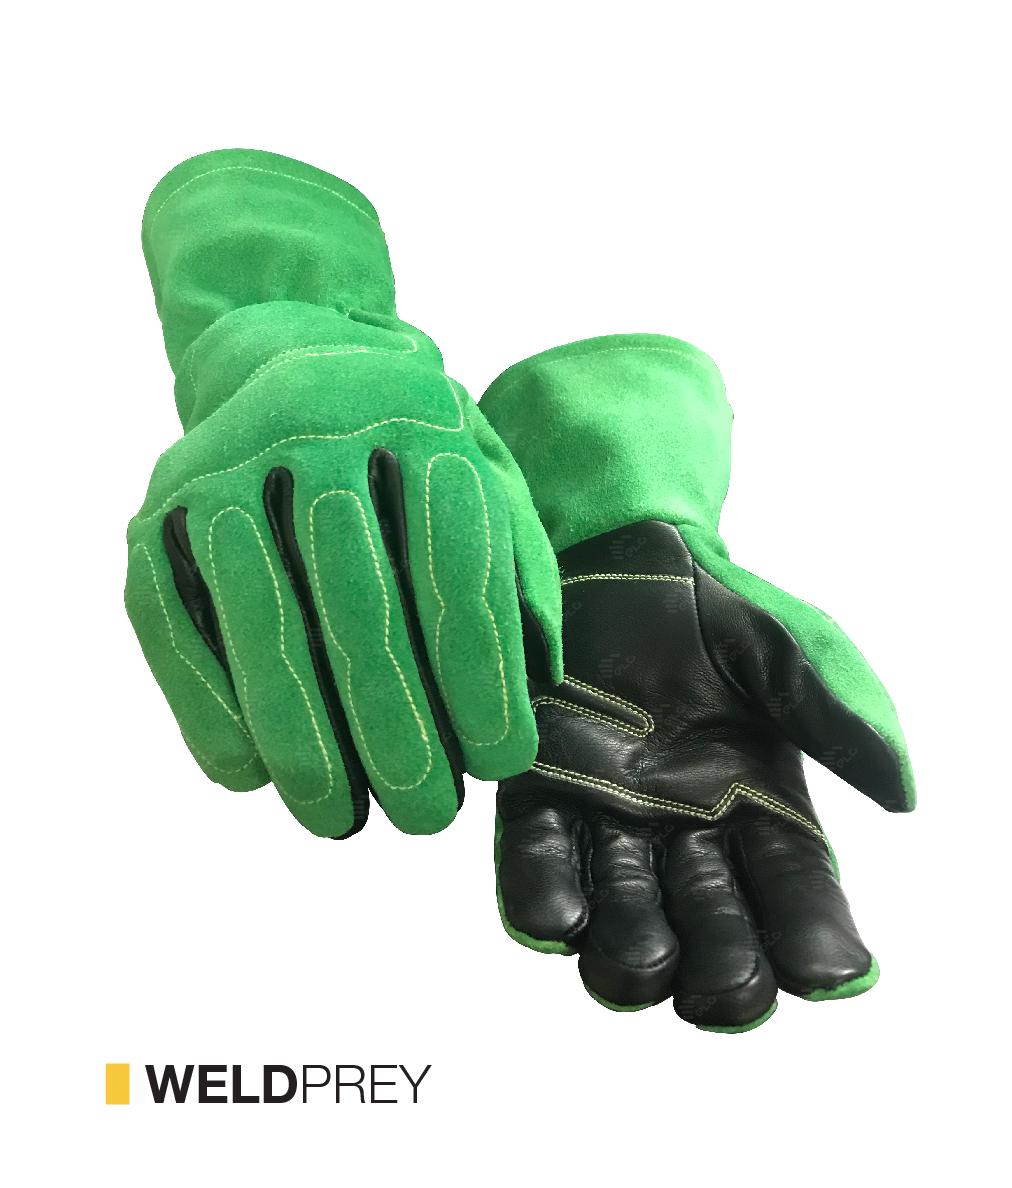 WELDPREY cut-resistant gloves by elite leather